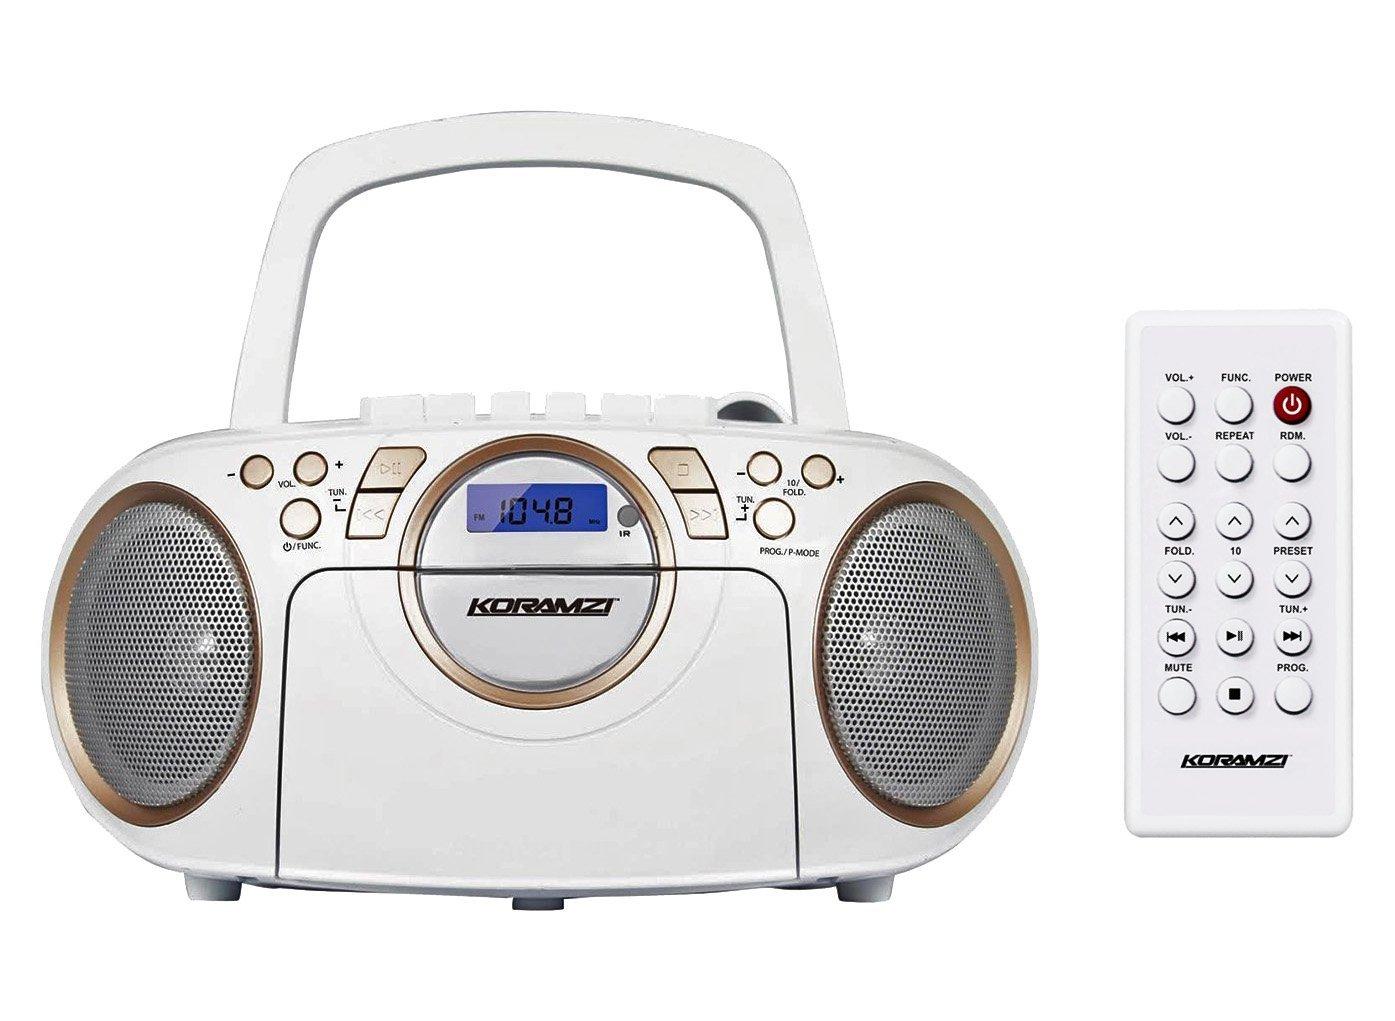 Koramzi Portable Top Loading Headphone CD705CWH